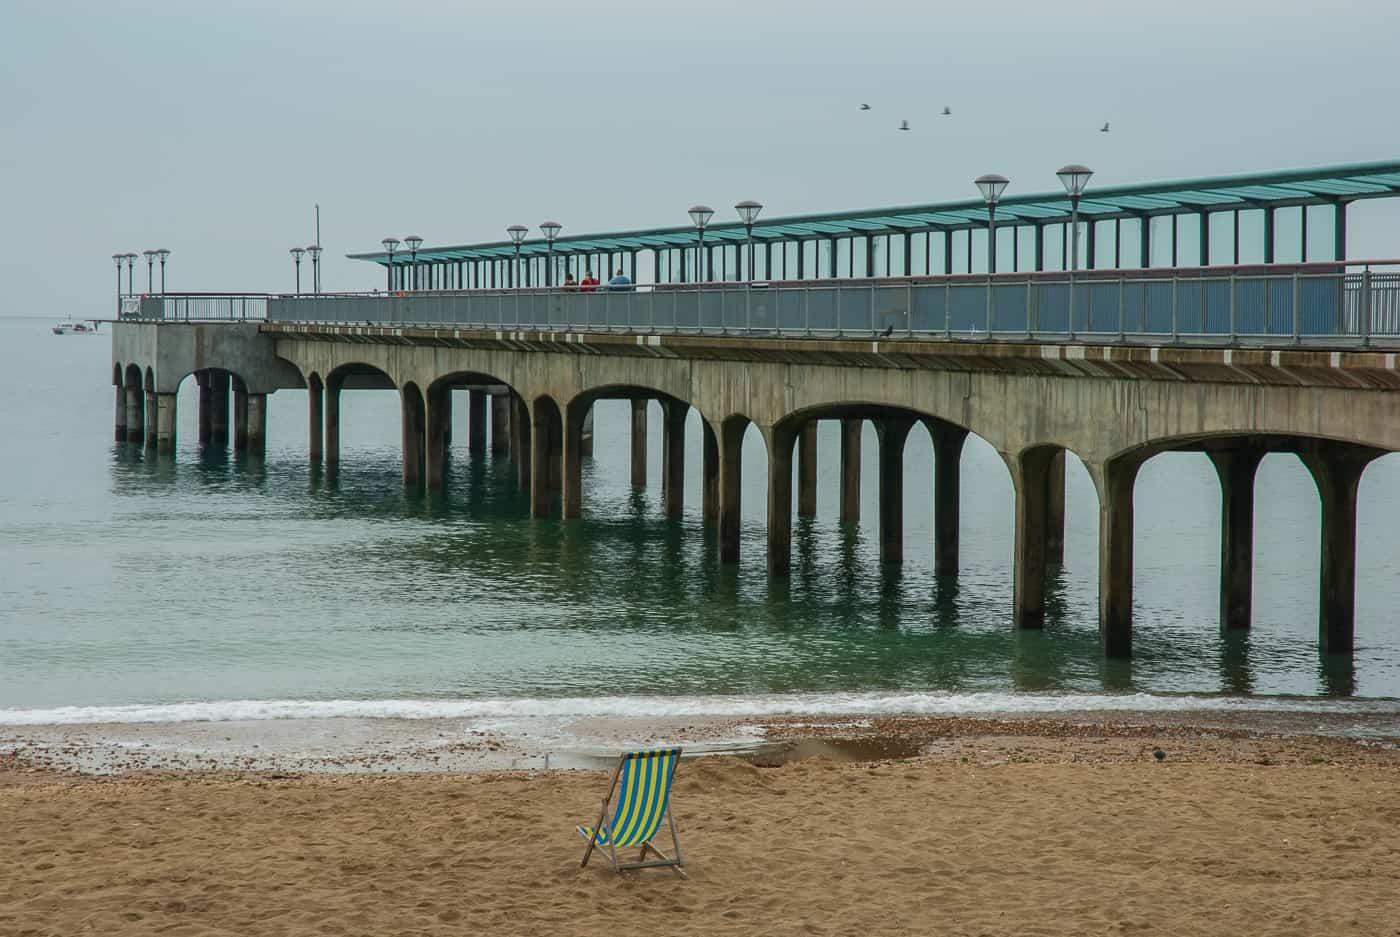 Boscombe-Pier-beach-0079